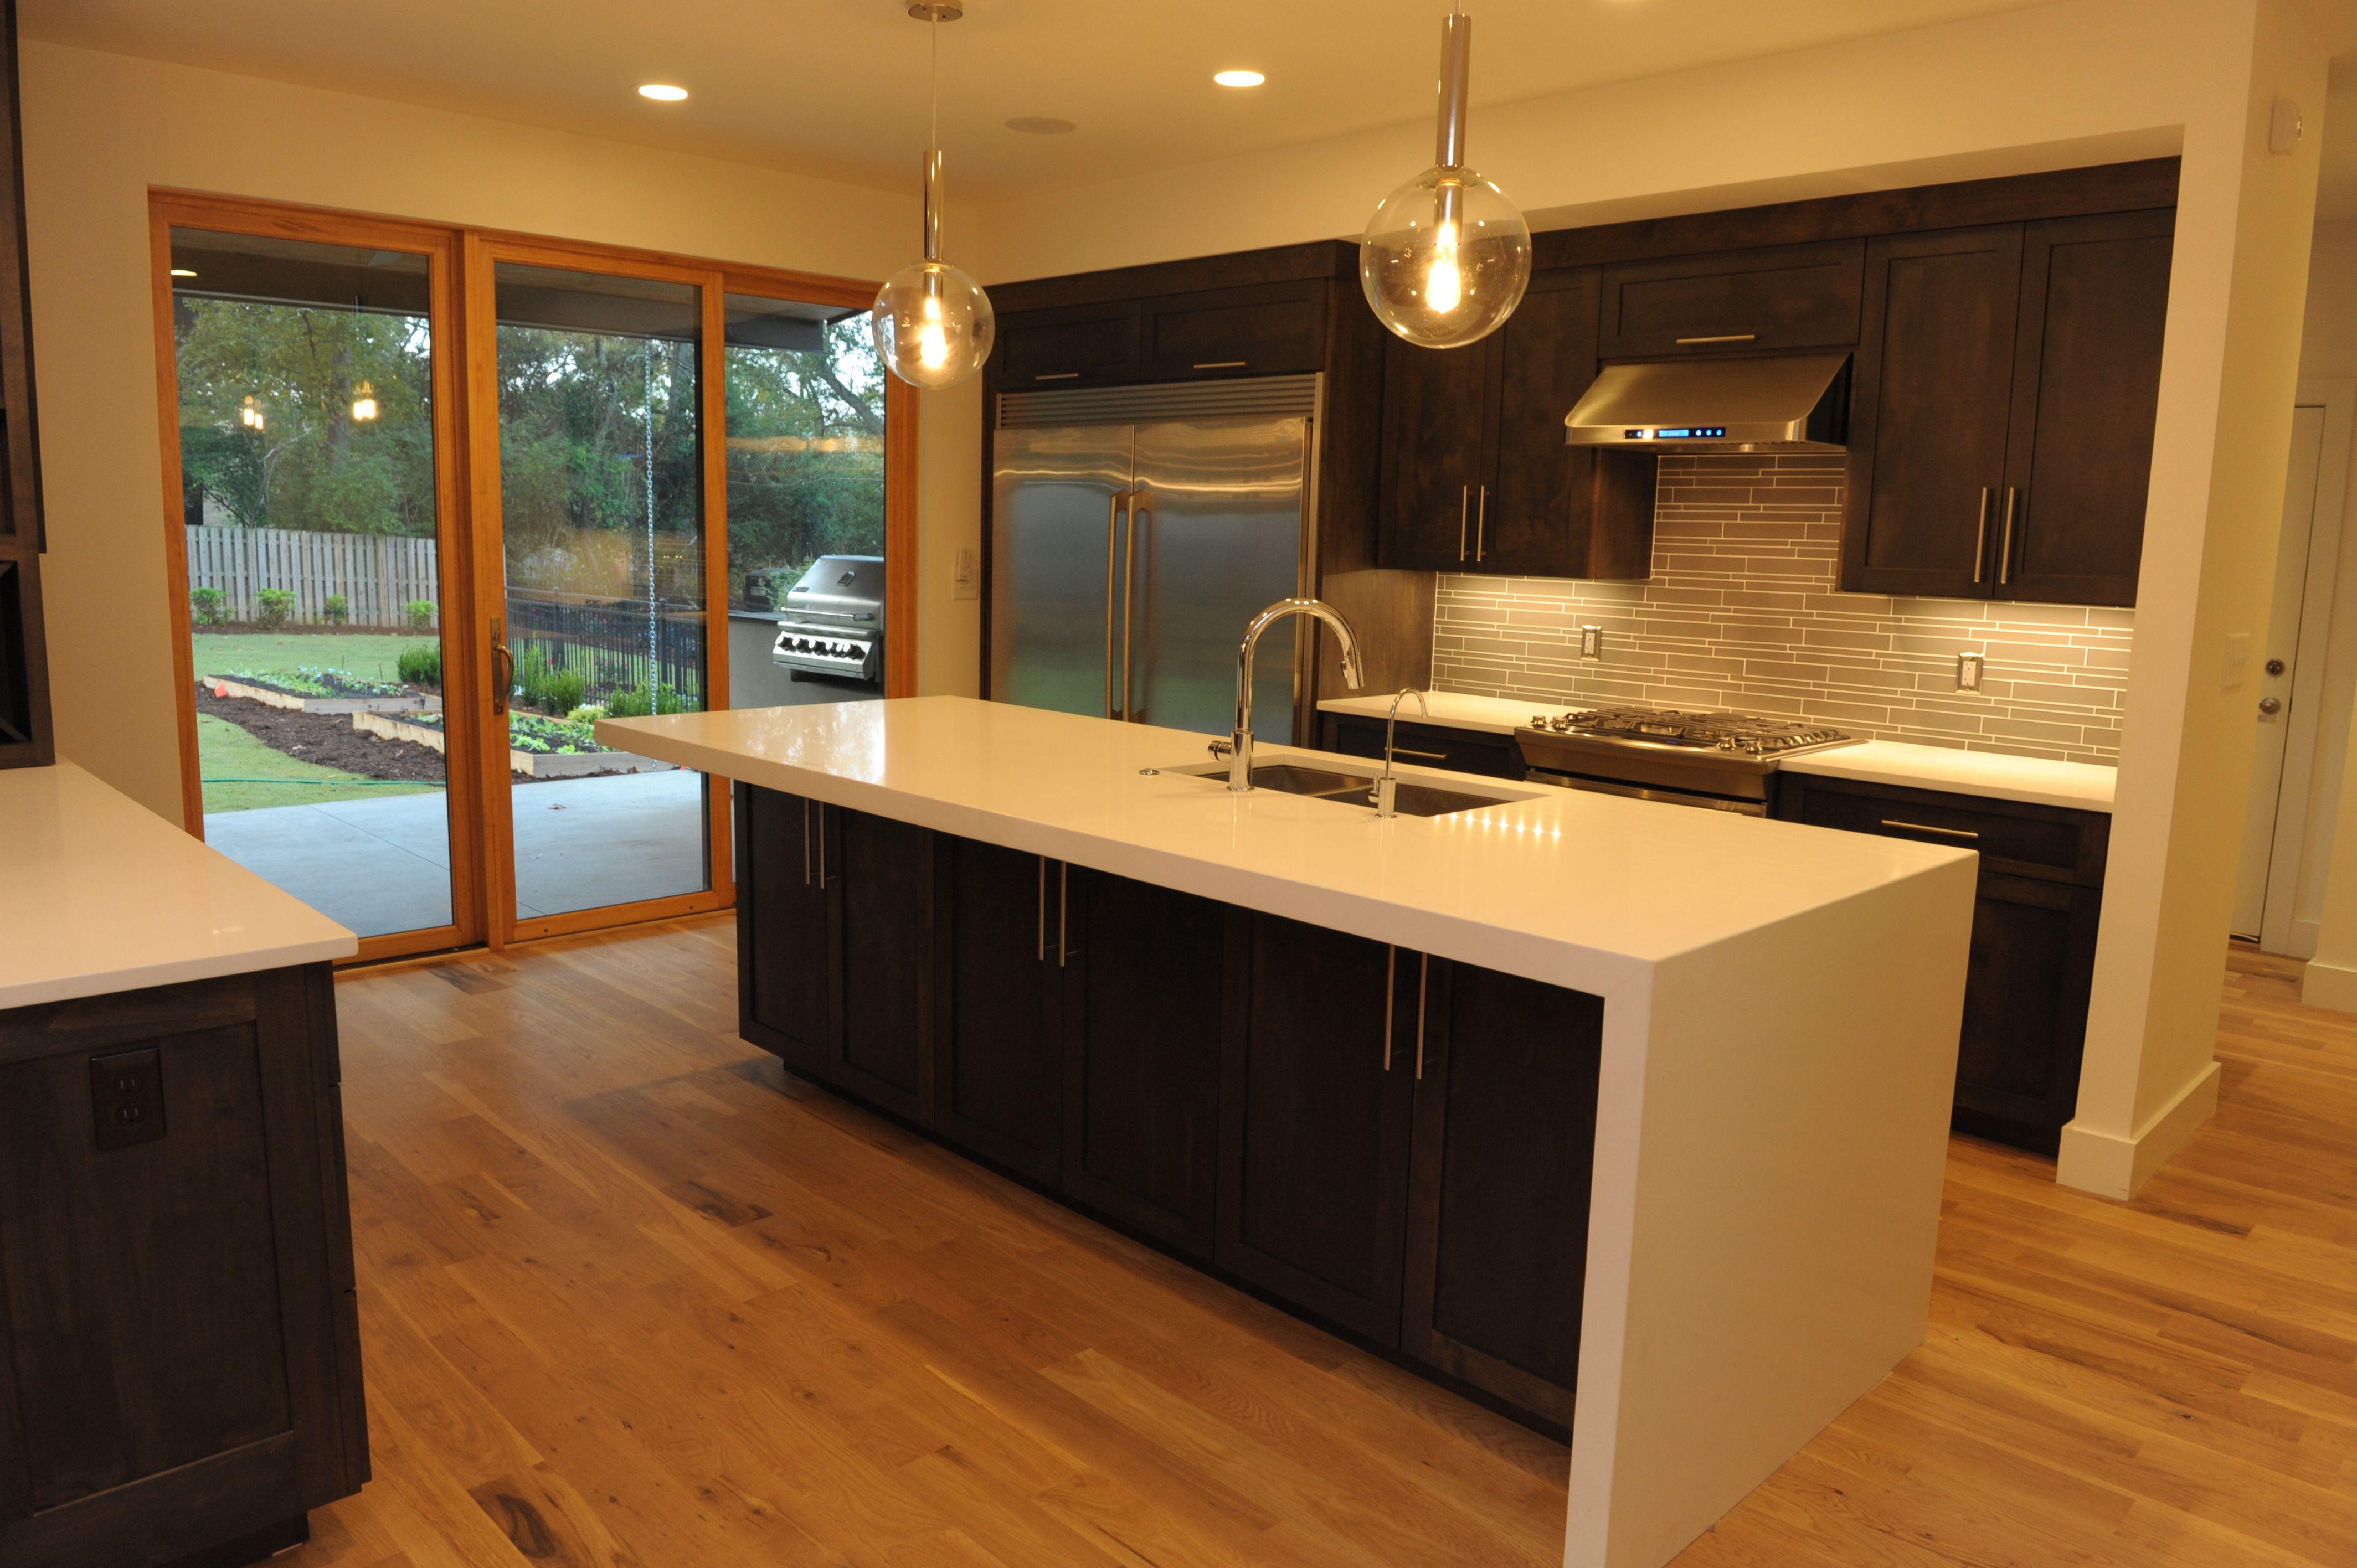 quartz waterfall island parallel kitchen layout waterfall island kitchen kitchen layout on kitchen island ideas white quartz id=11633